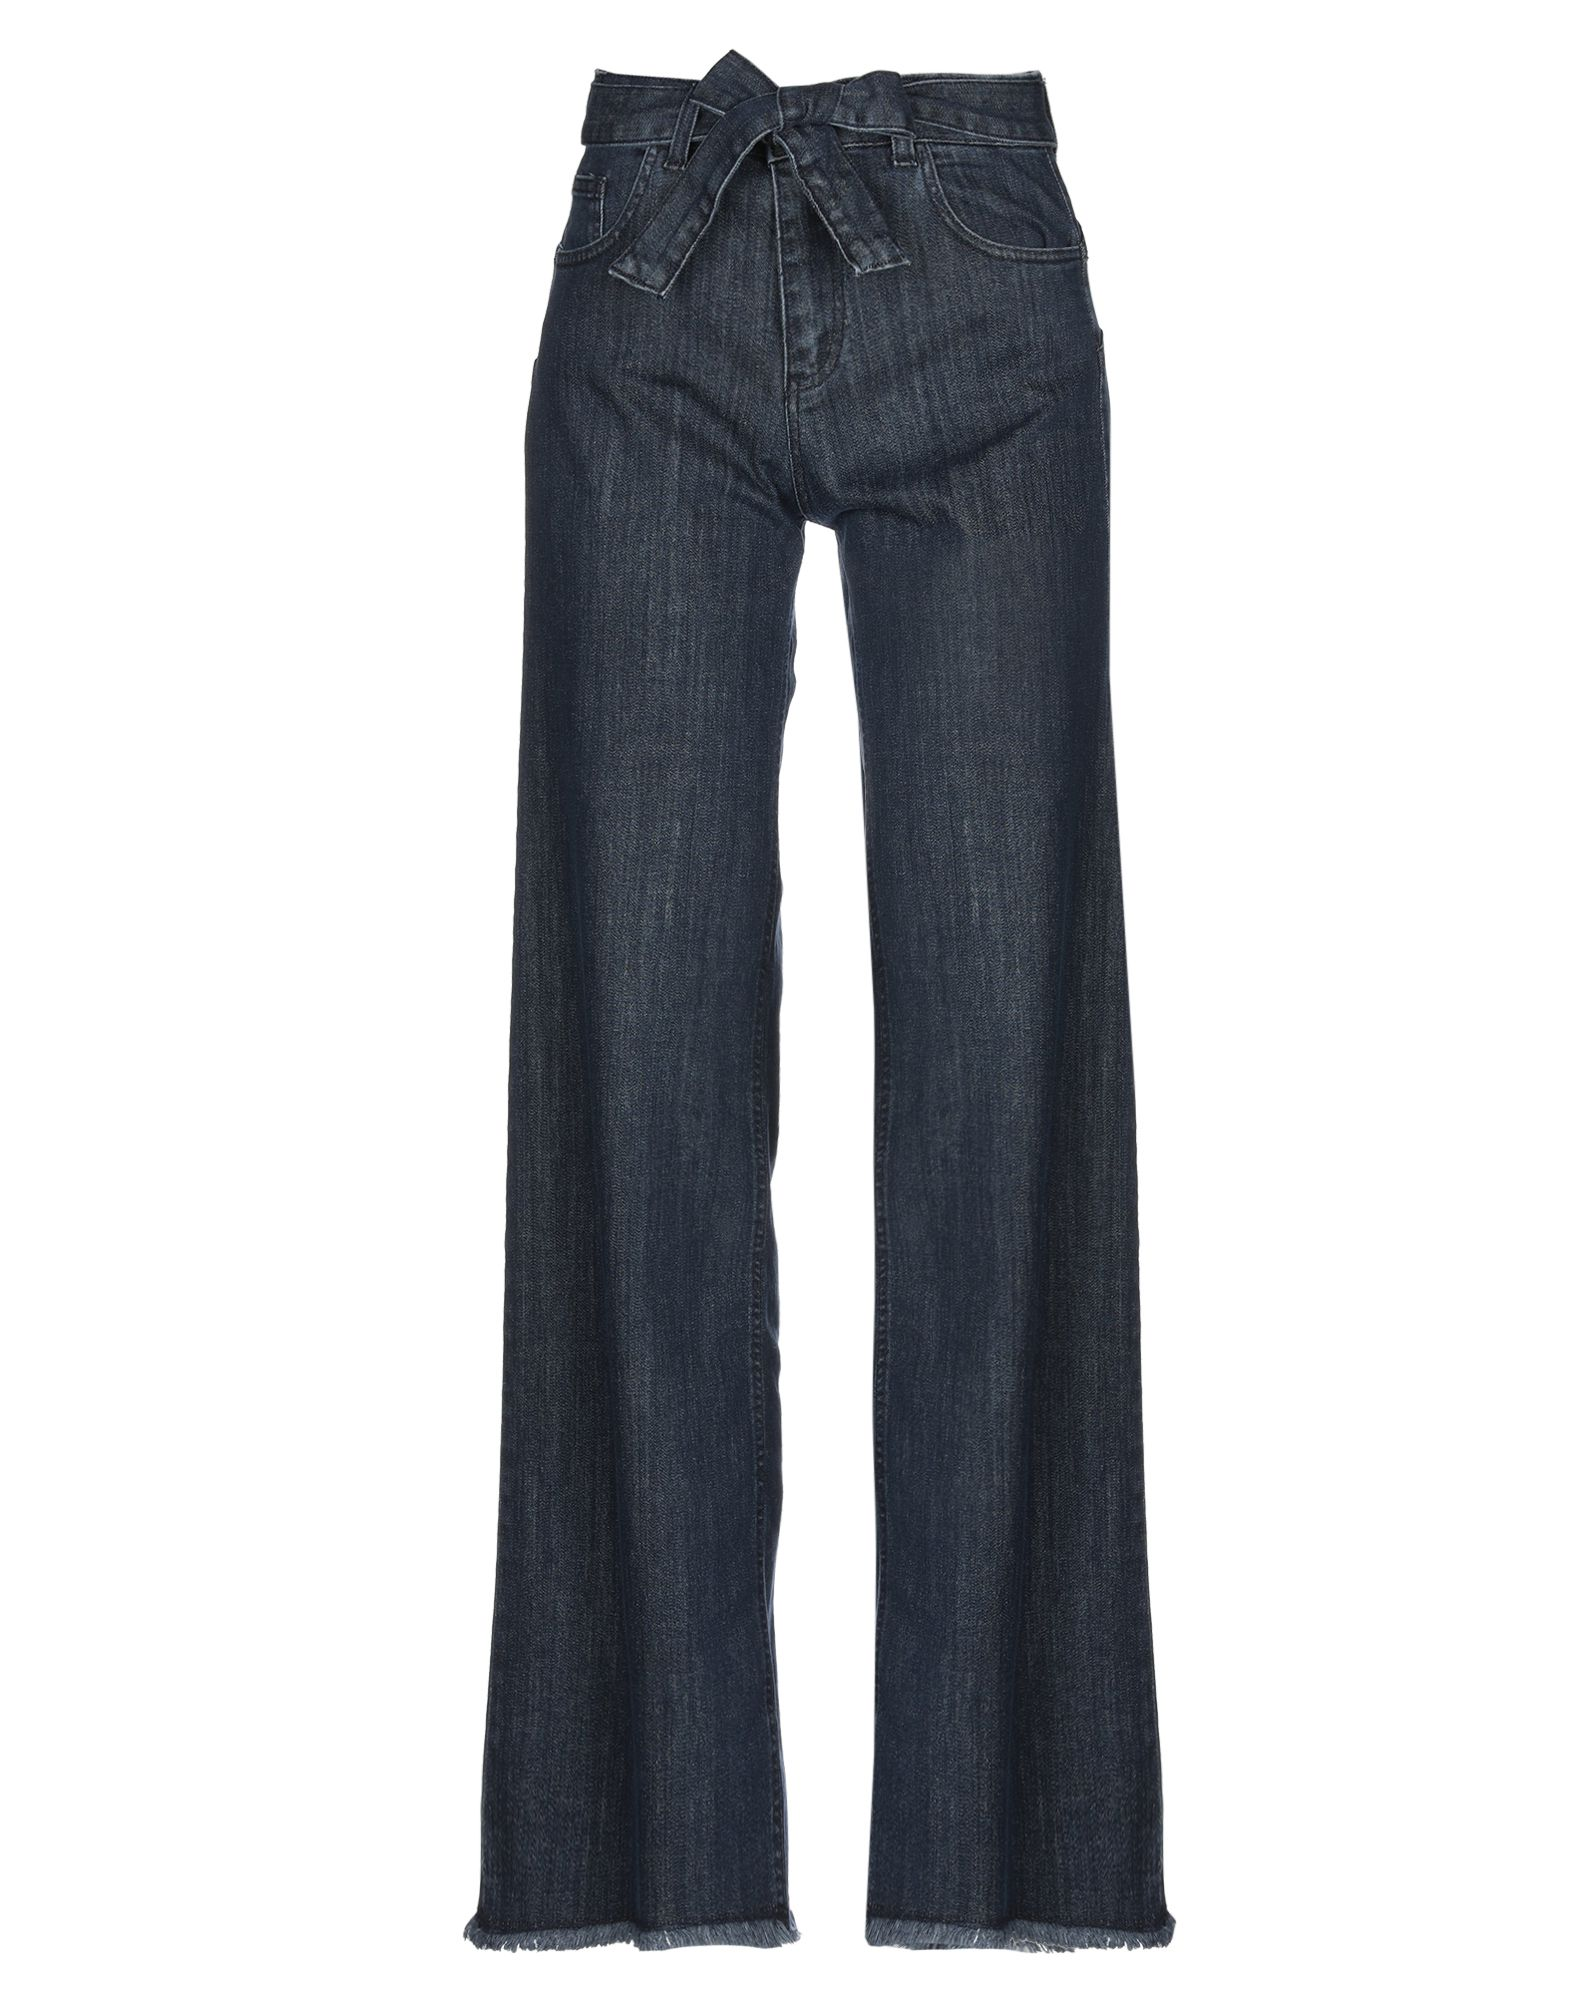 PAOLA PRATA Джинсовые брюки paola prata брюки капри